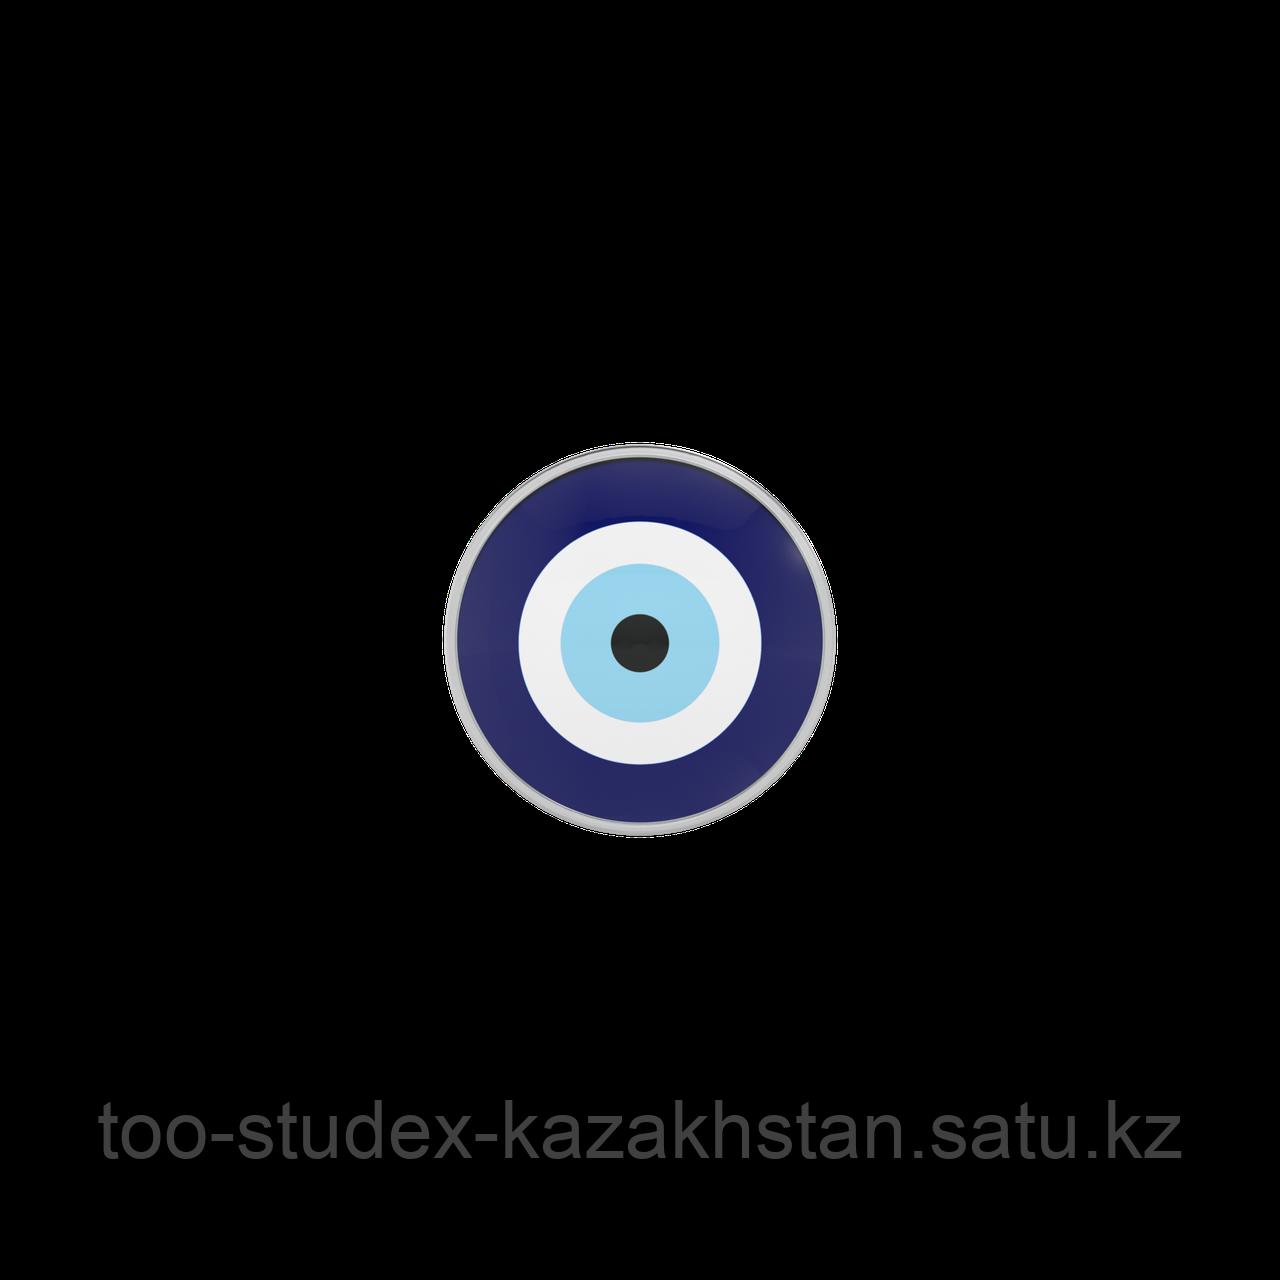 "7512-0668 Серьги для прокола STUDEX System75 ""Назар"" - фото 3"